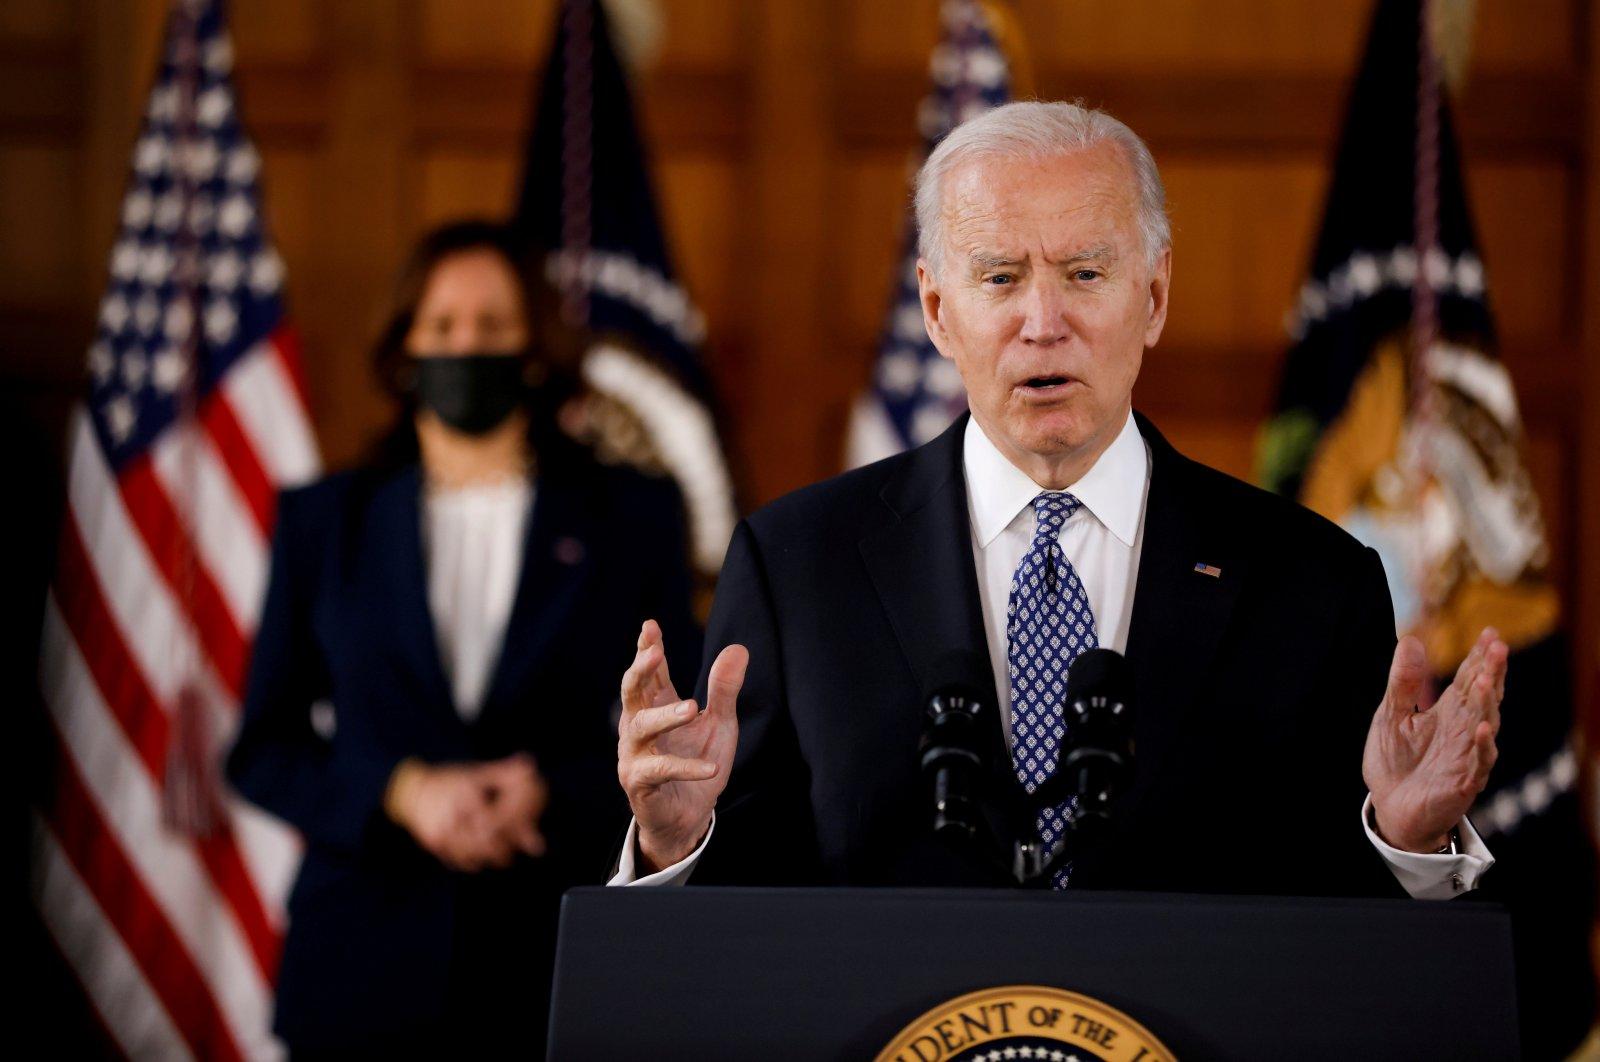 U.S. President Joe Biden and Vice President Kamala Harris deliver remarks in Atlanta, Georgia, U.S., March 19, 2021. (Reuters Photo)